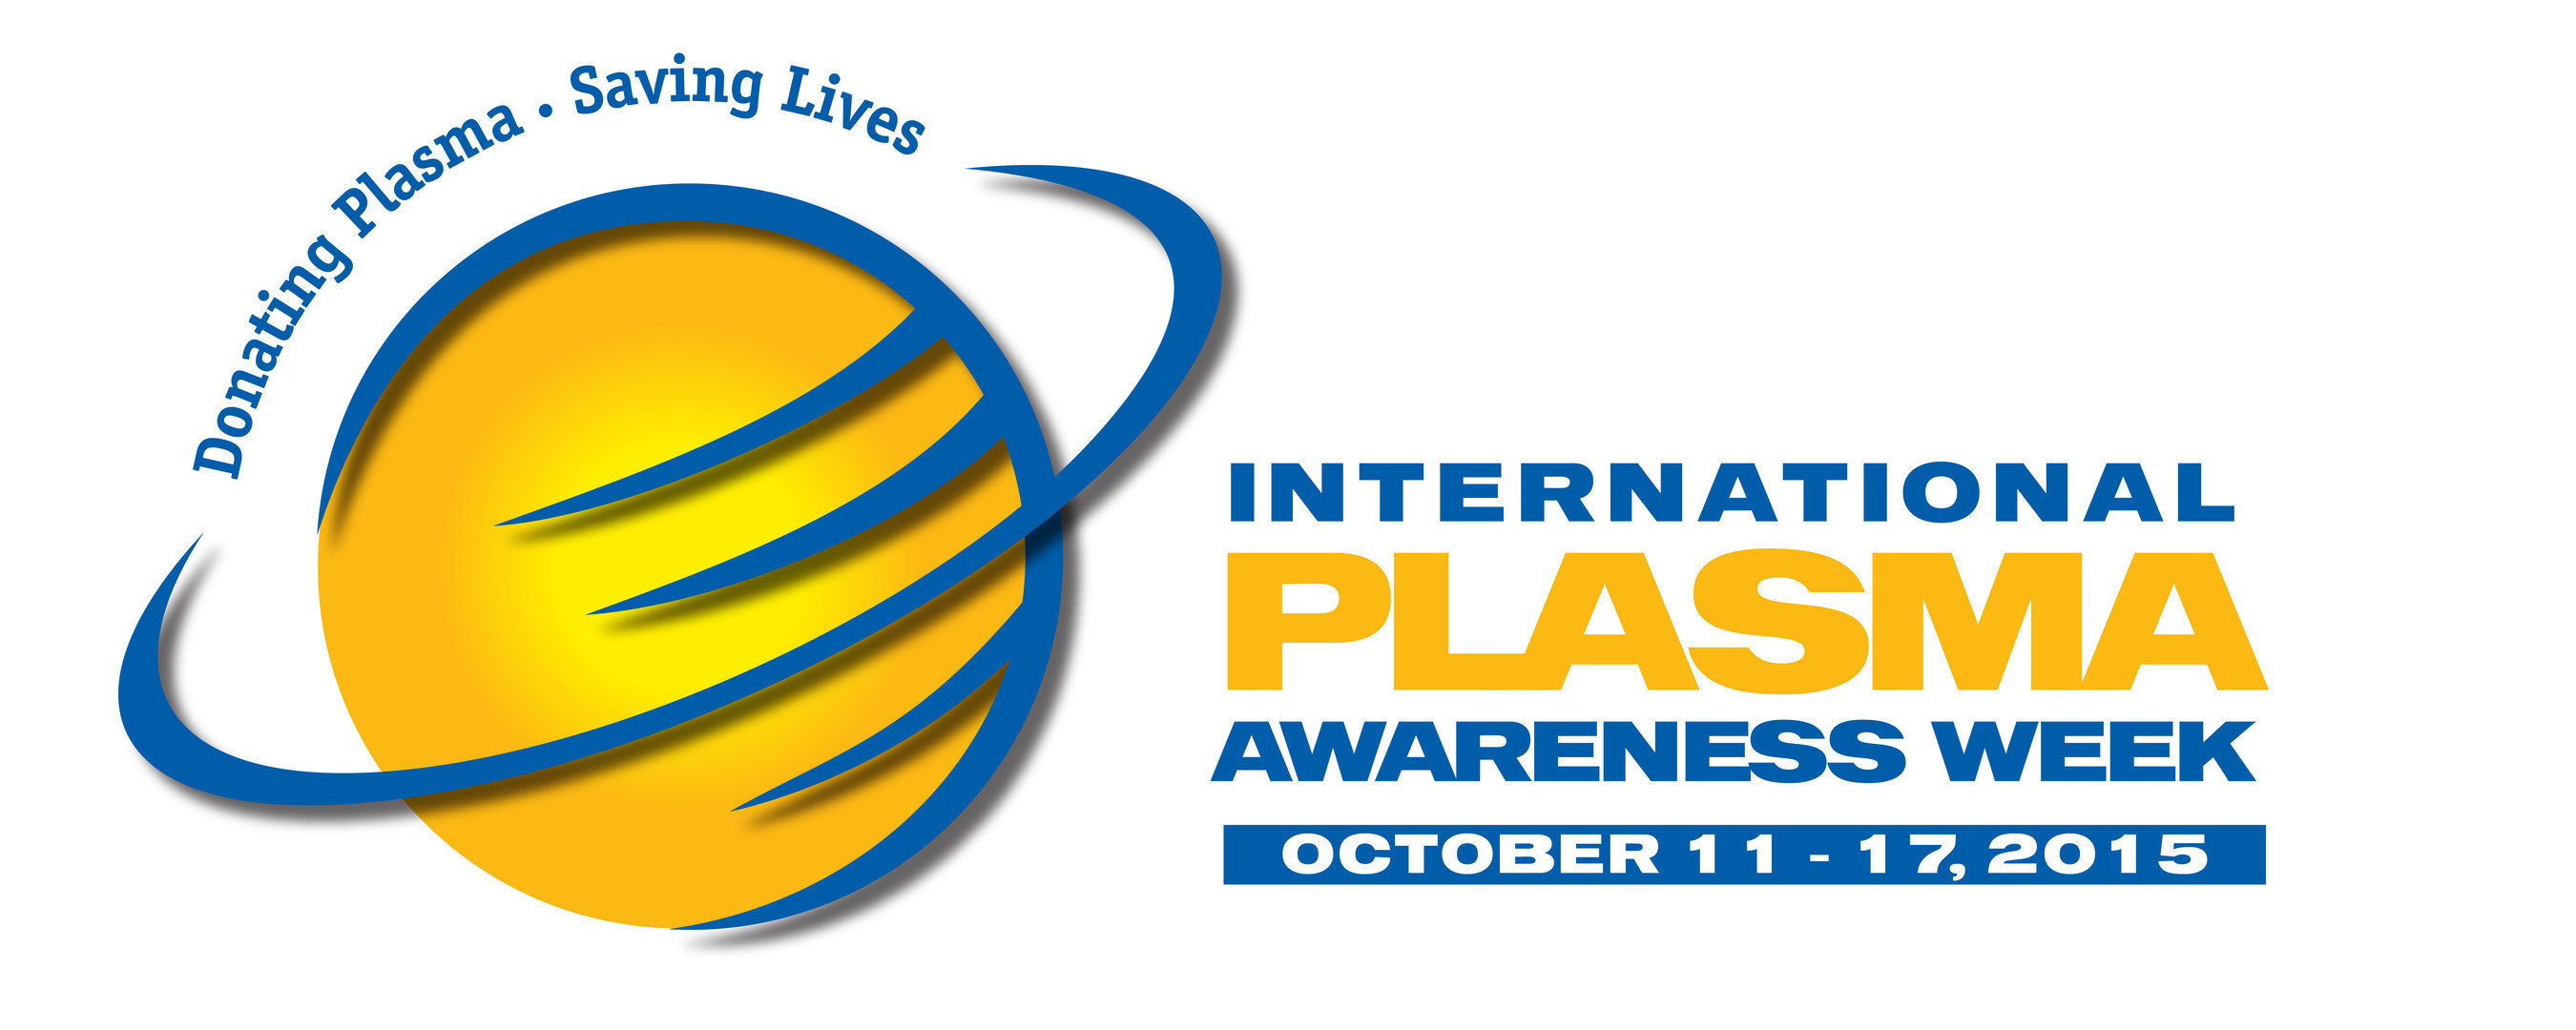 PPTA feiert die International Plasma Awareness Week